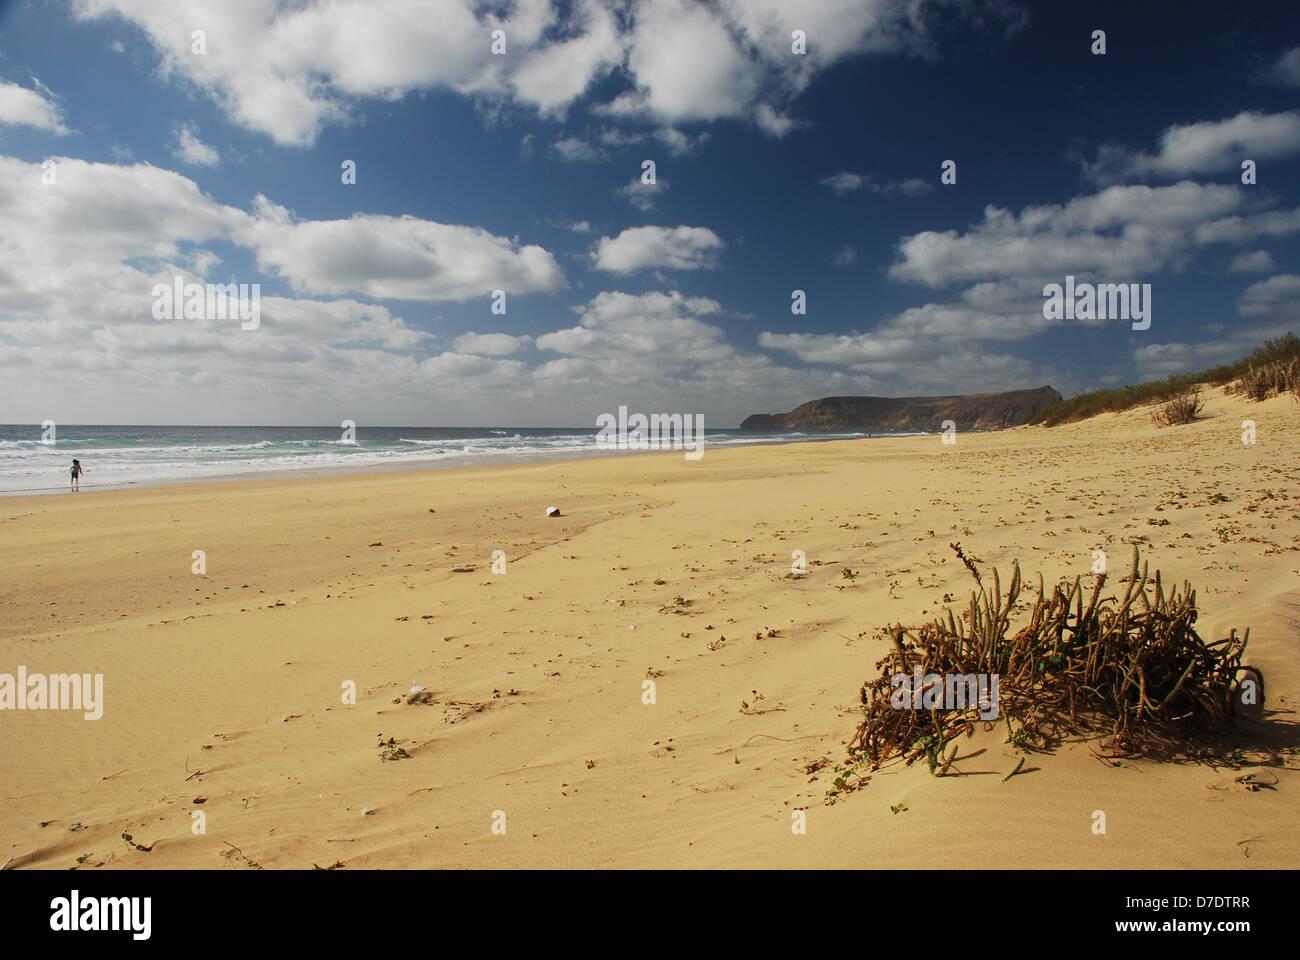 The main beach. Porto Santo. Portugal - Stock Image